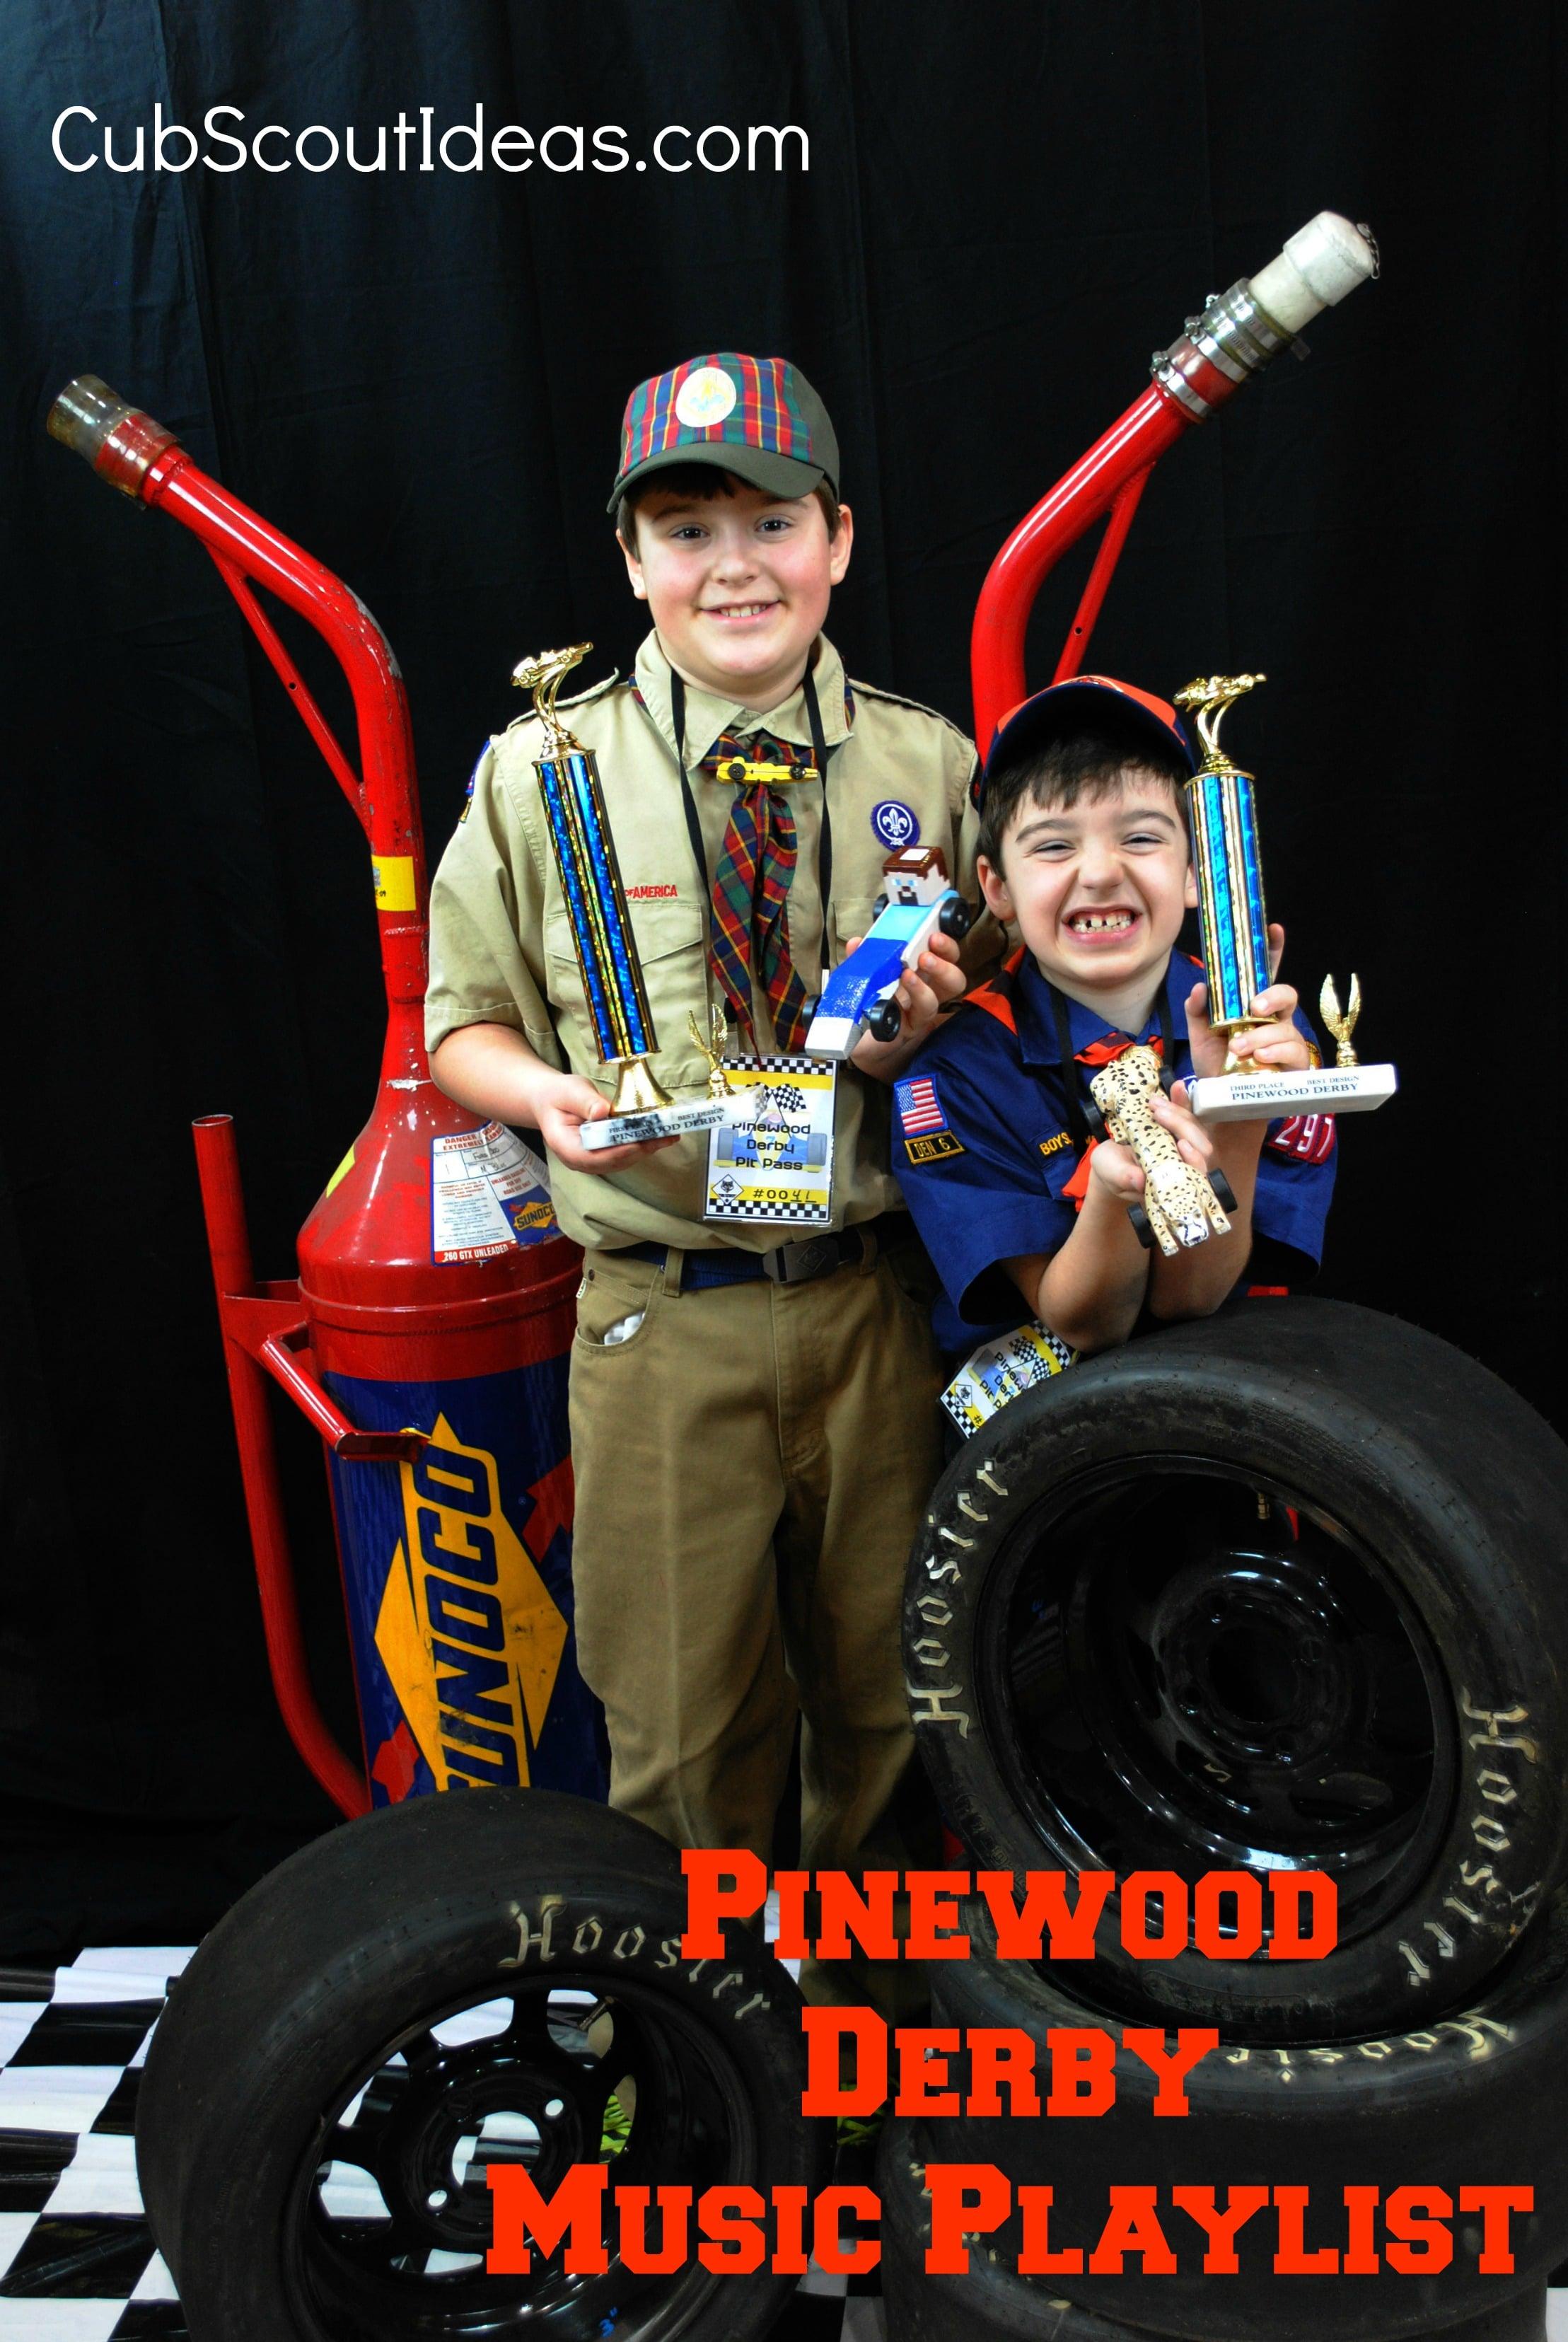 Fun Pinewood Derby Music